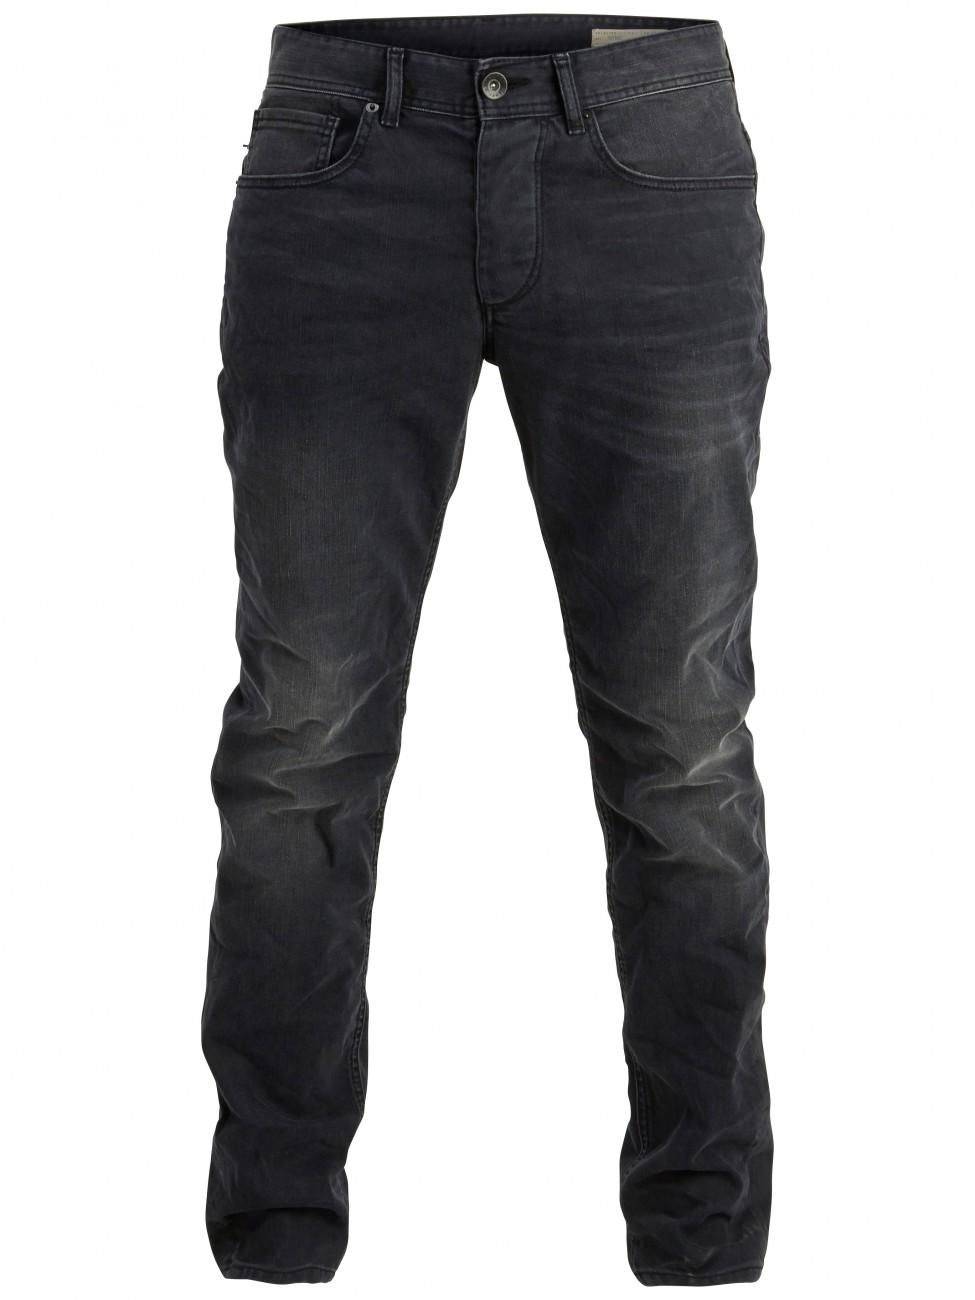 selected mens jeans 16038457 one 4166 grey jeans noos. Black Bedroom Furniture Sets. Home Design Ideas